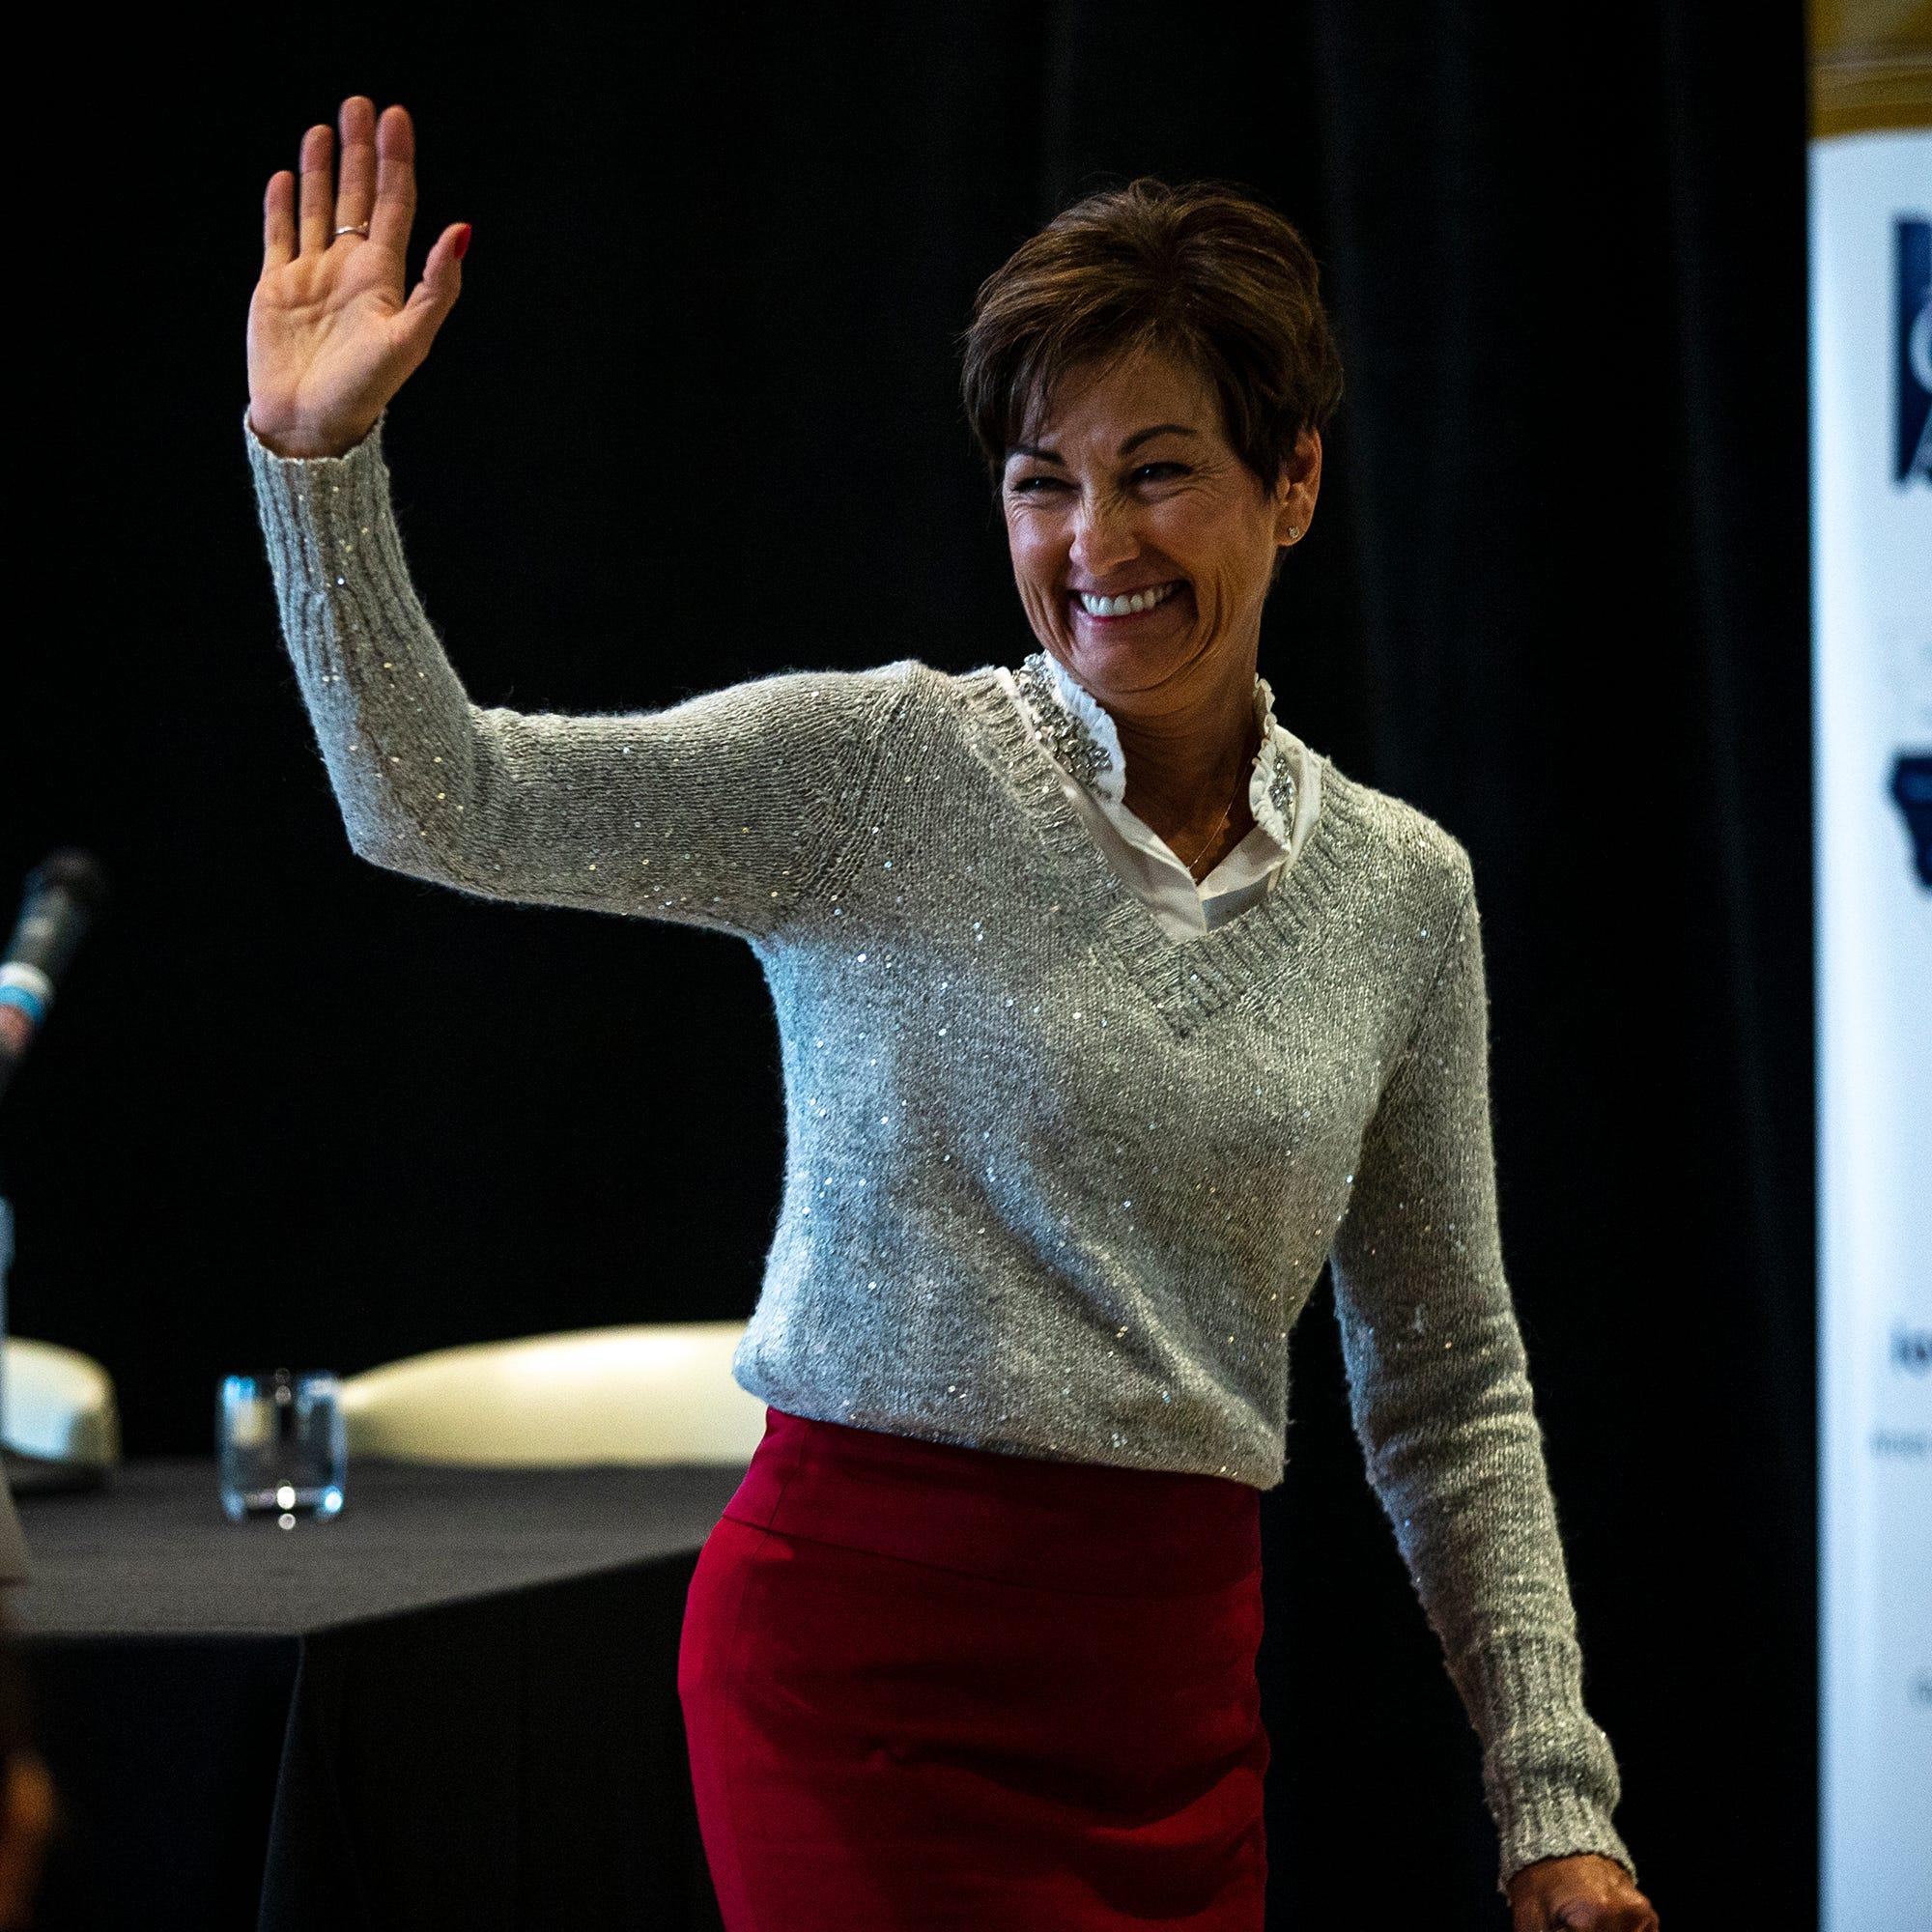 Newly elected governor Kim Reynolds follows a long line of trailblazing Iowa women